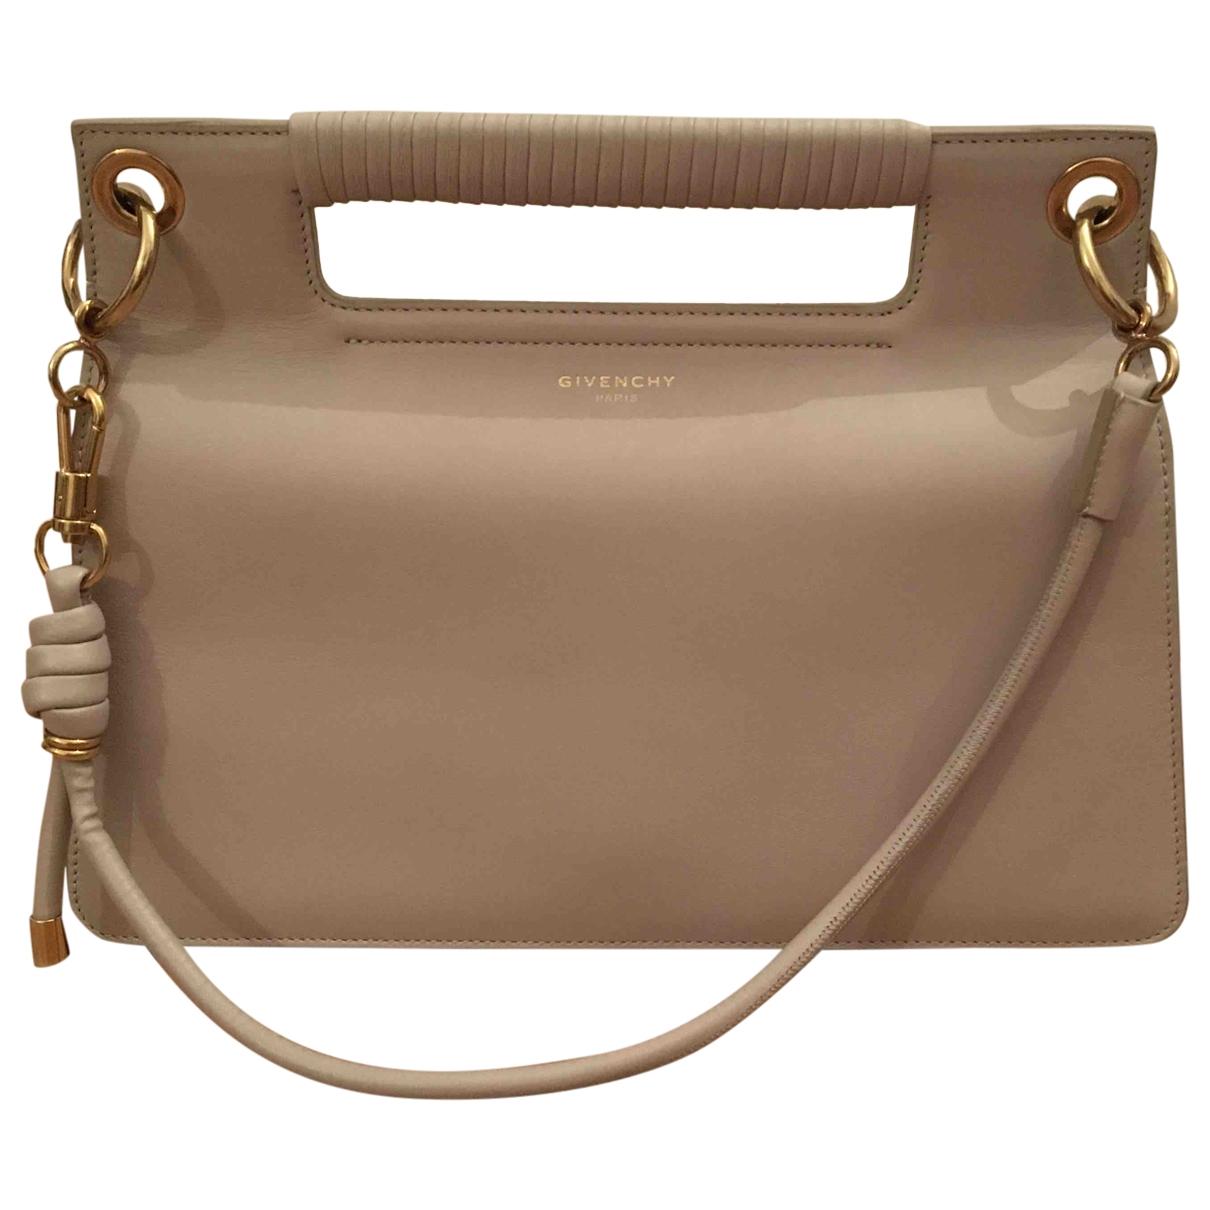 Givenchy - Sac a main Whip pour femme en cuir - beige